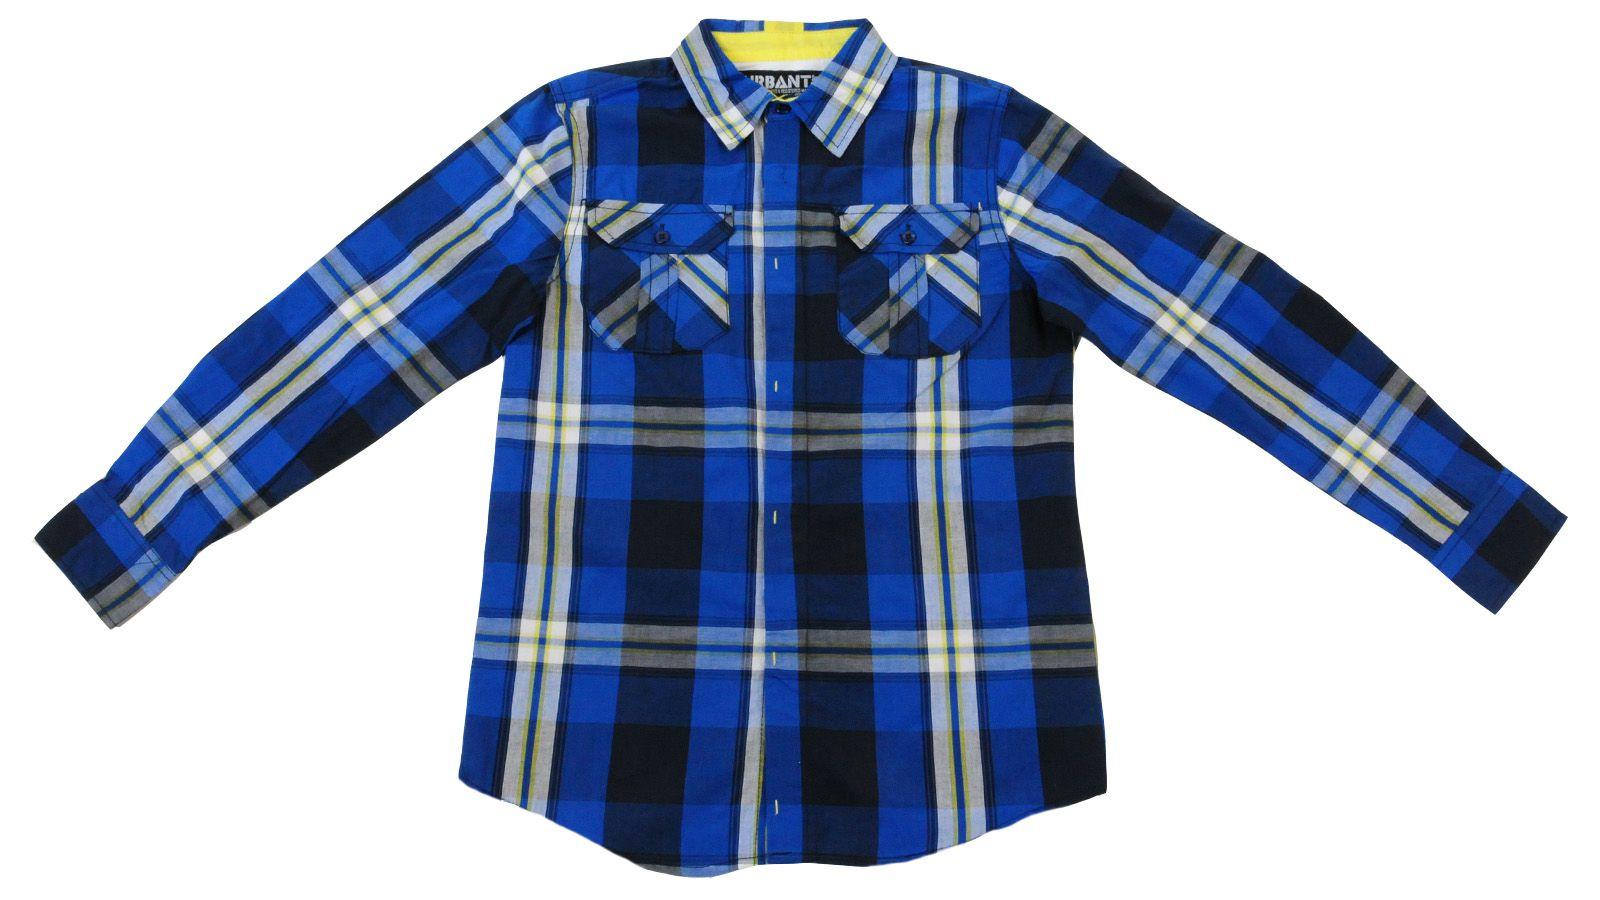 Удобная подростковая рубашка Urbant-вид спереди